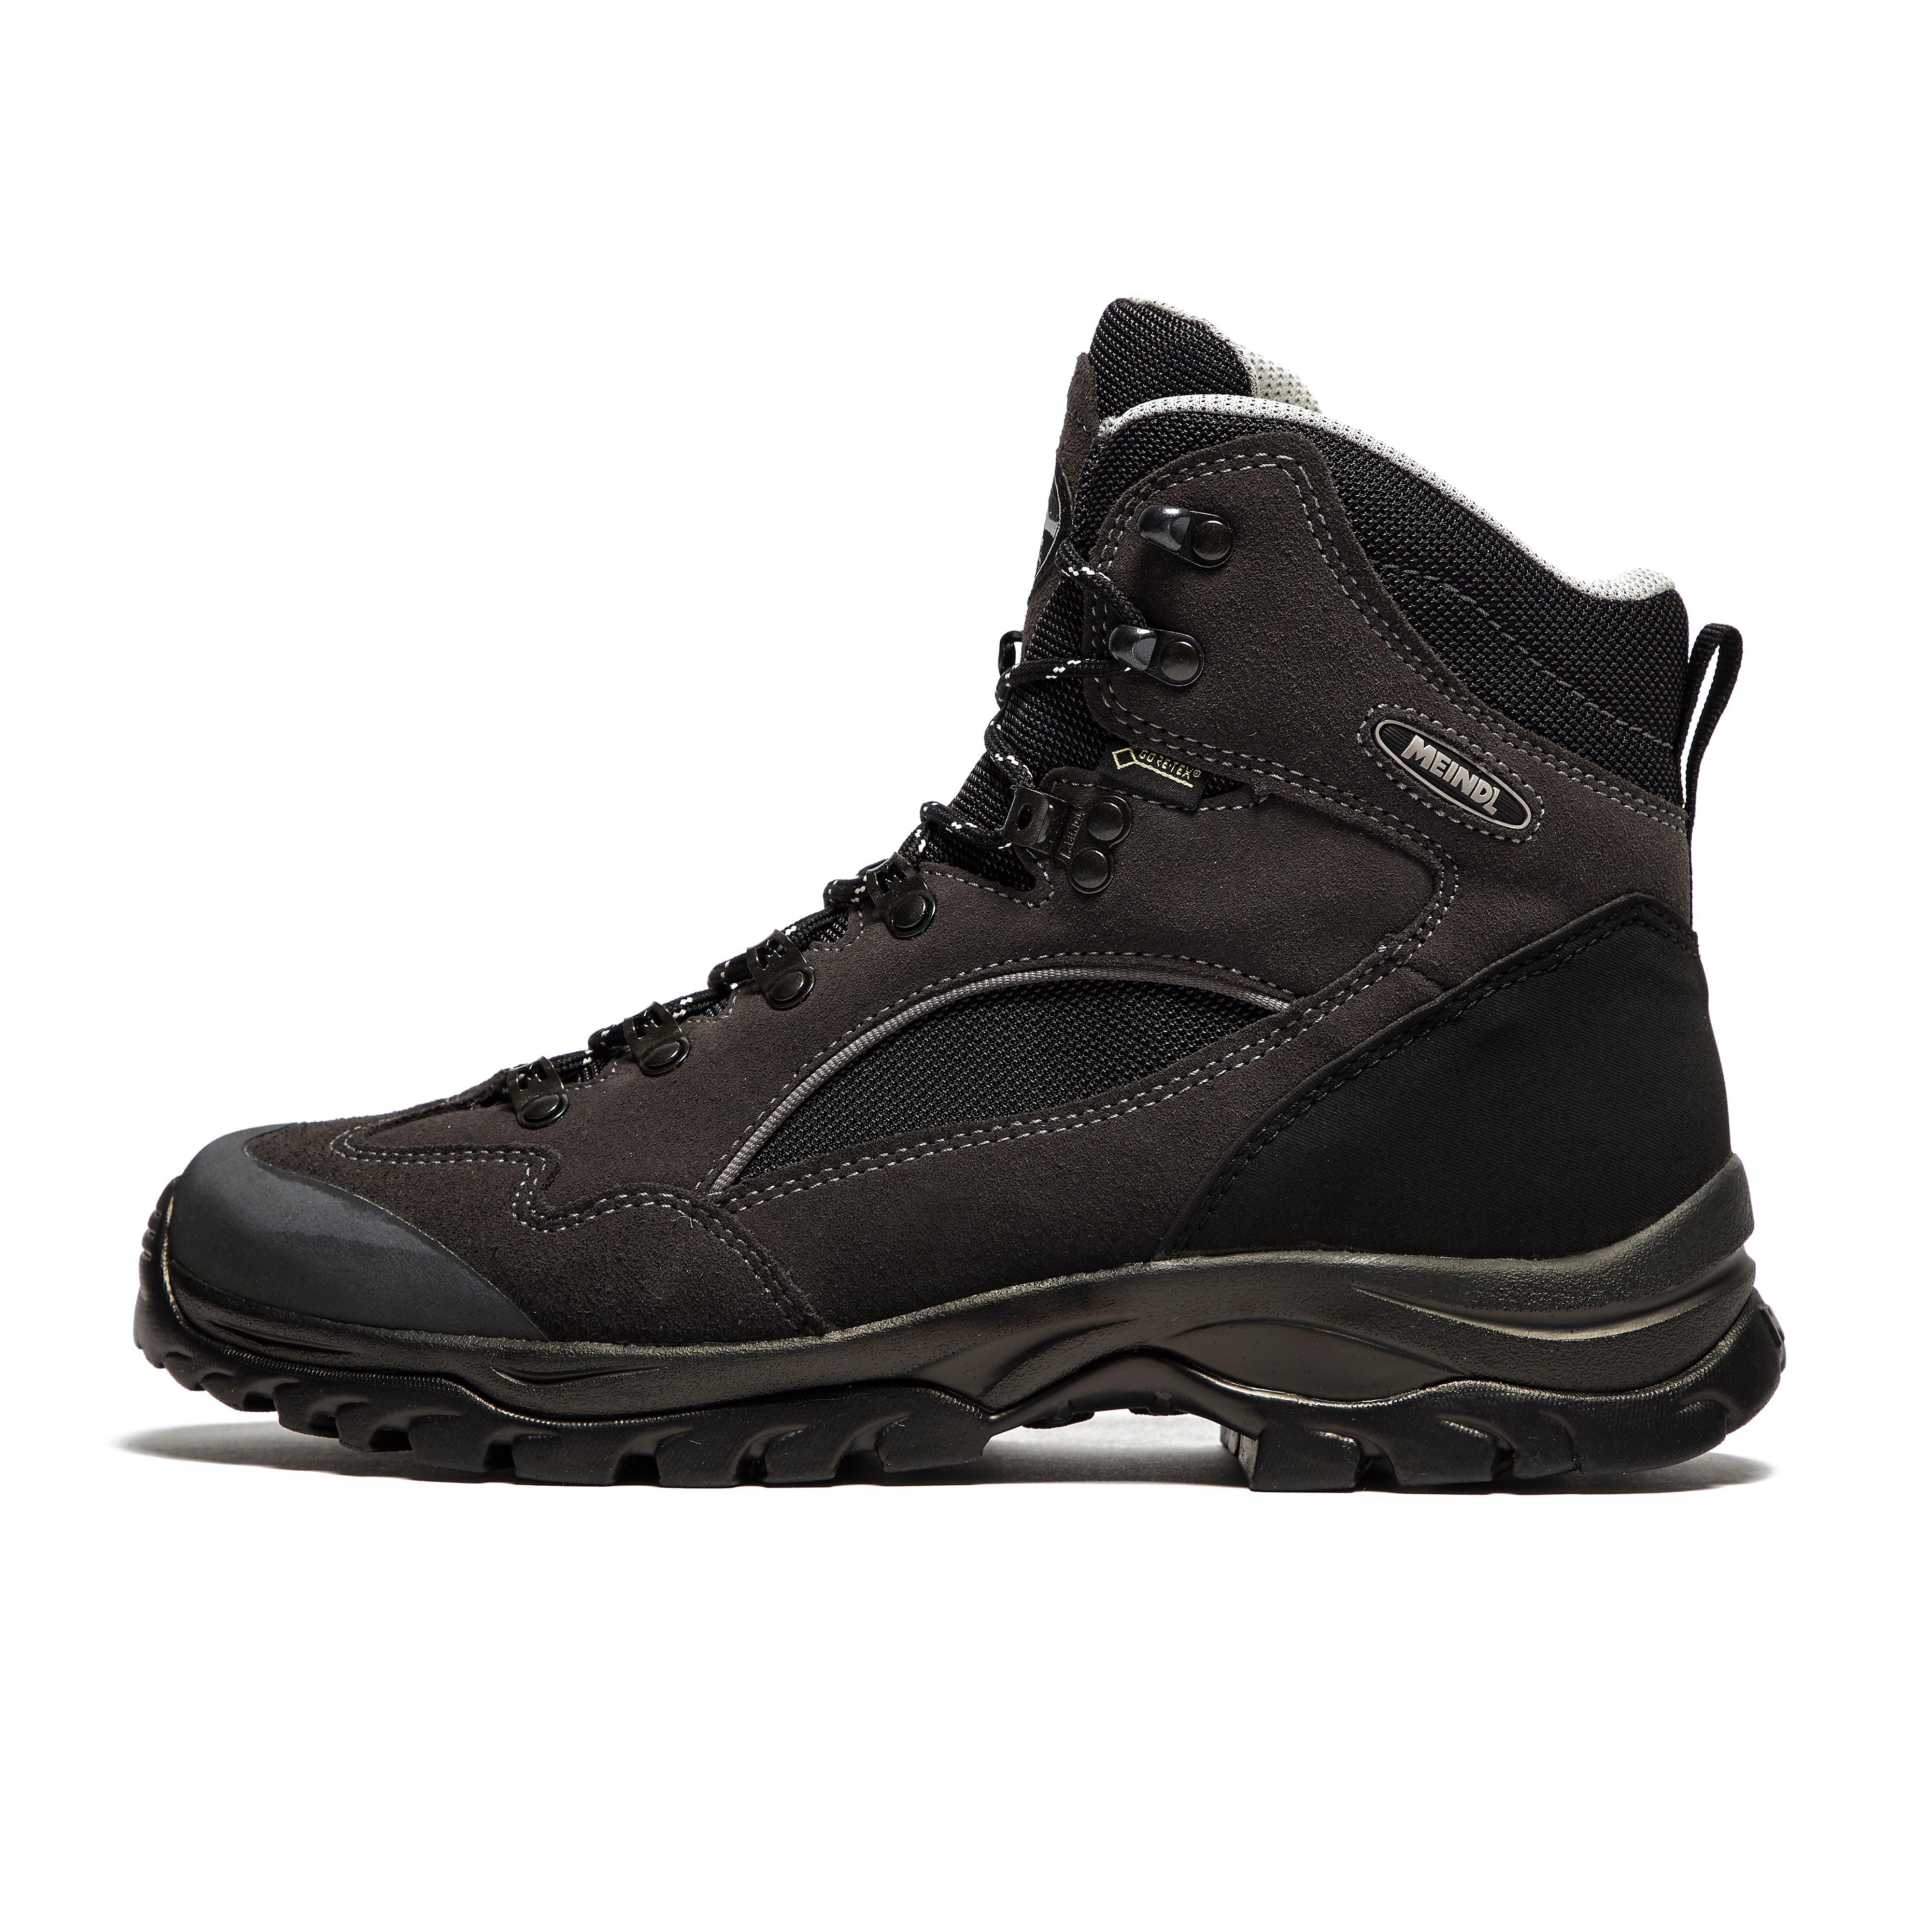 Meindl Chile MFS Men's Walking Boots